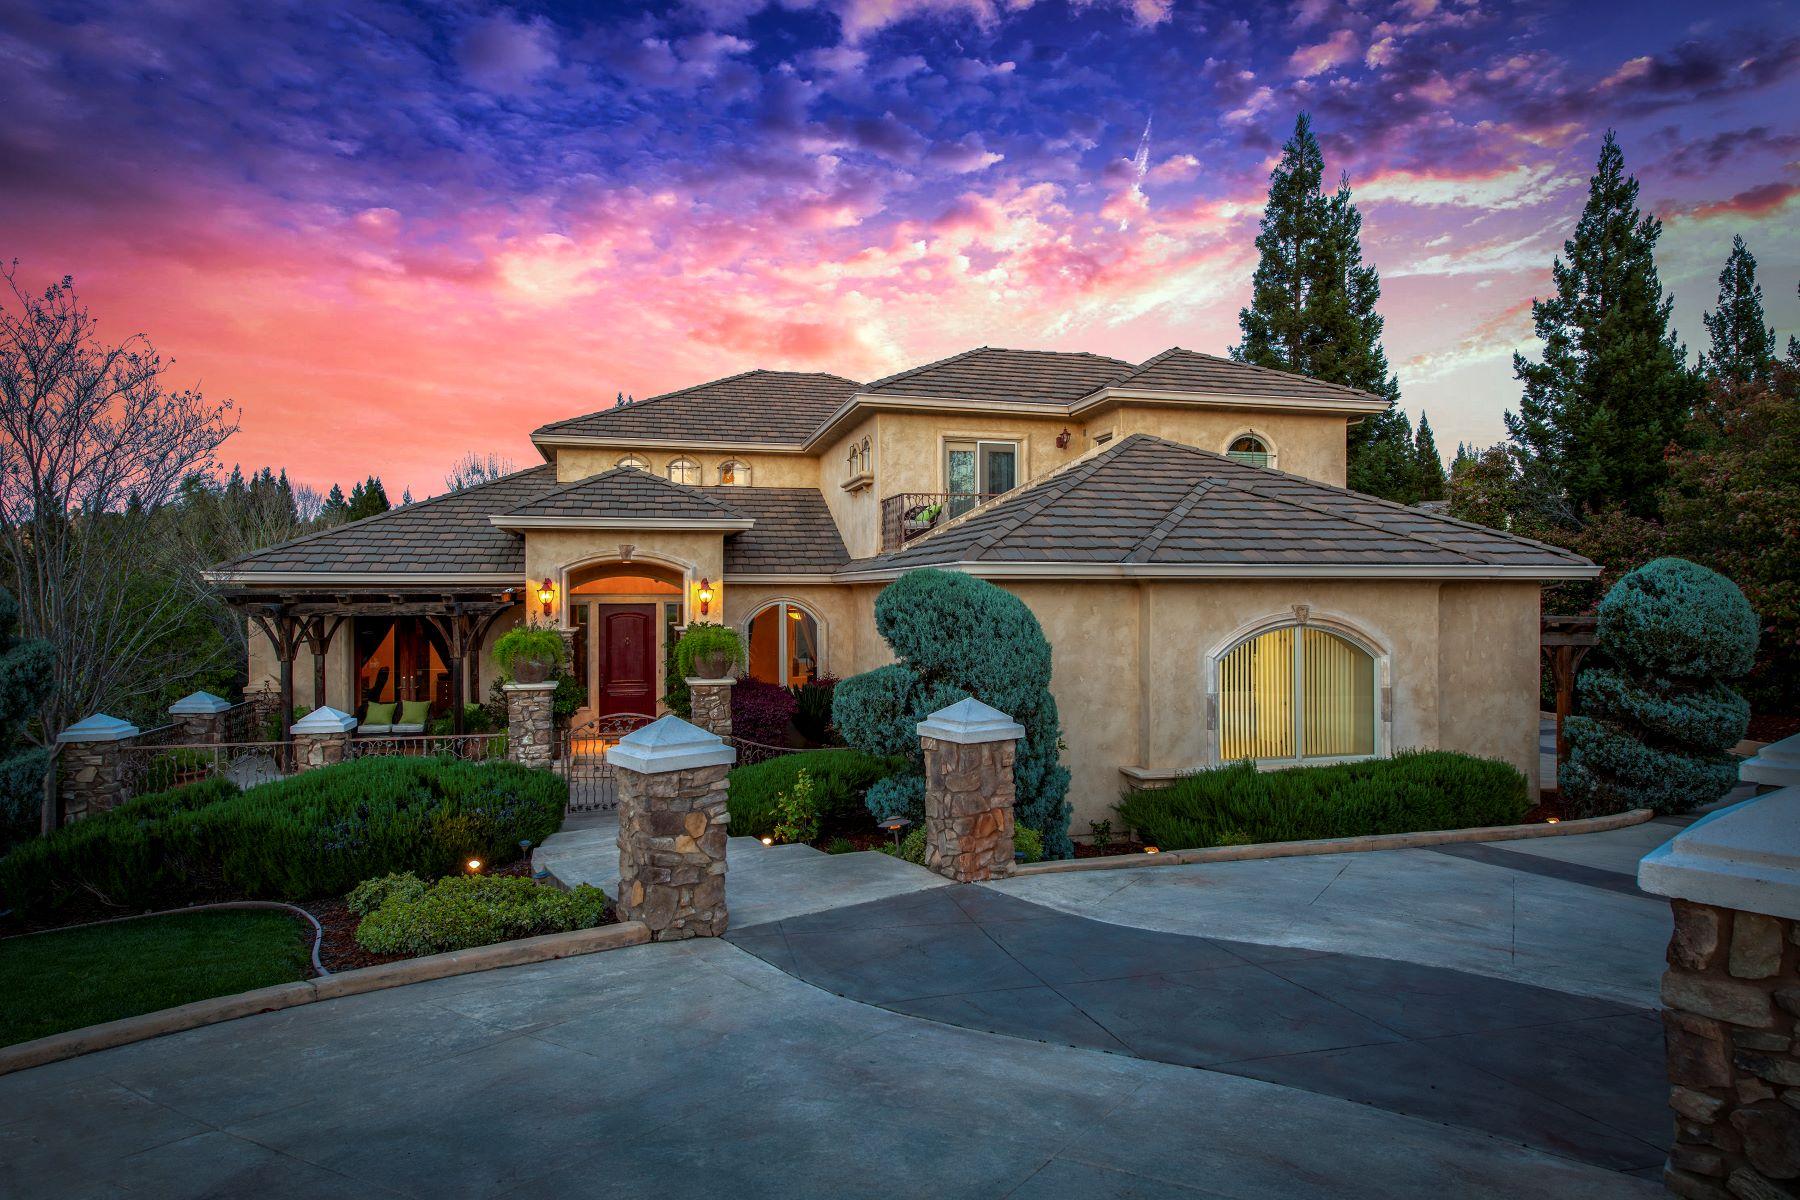 Single Family Home for Active at 9612 Jorney Court, Granite Bay, CA 95746 9612 Jorney Ct Granite Bay, California 95746 United States